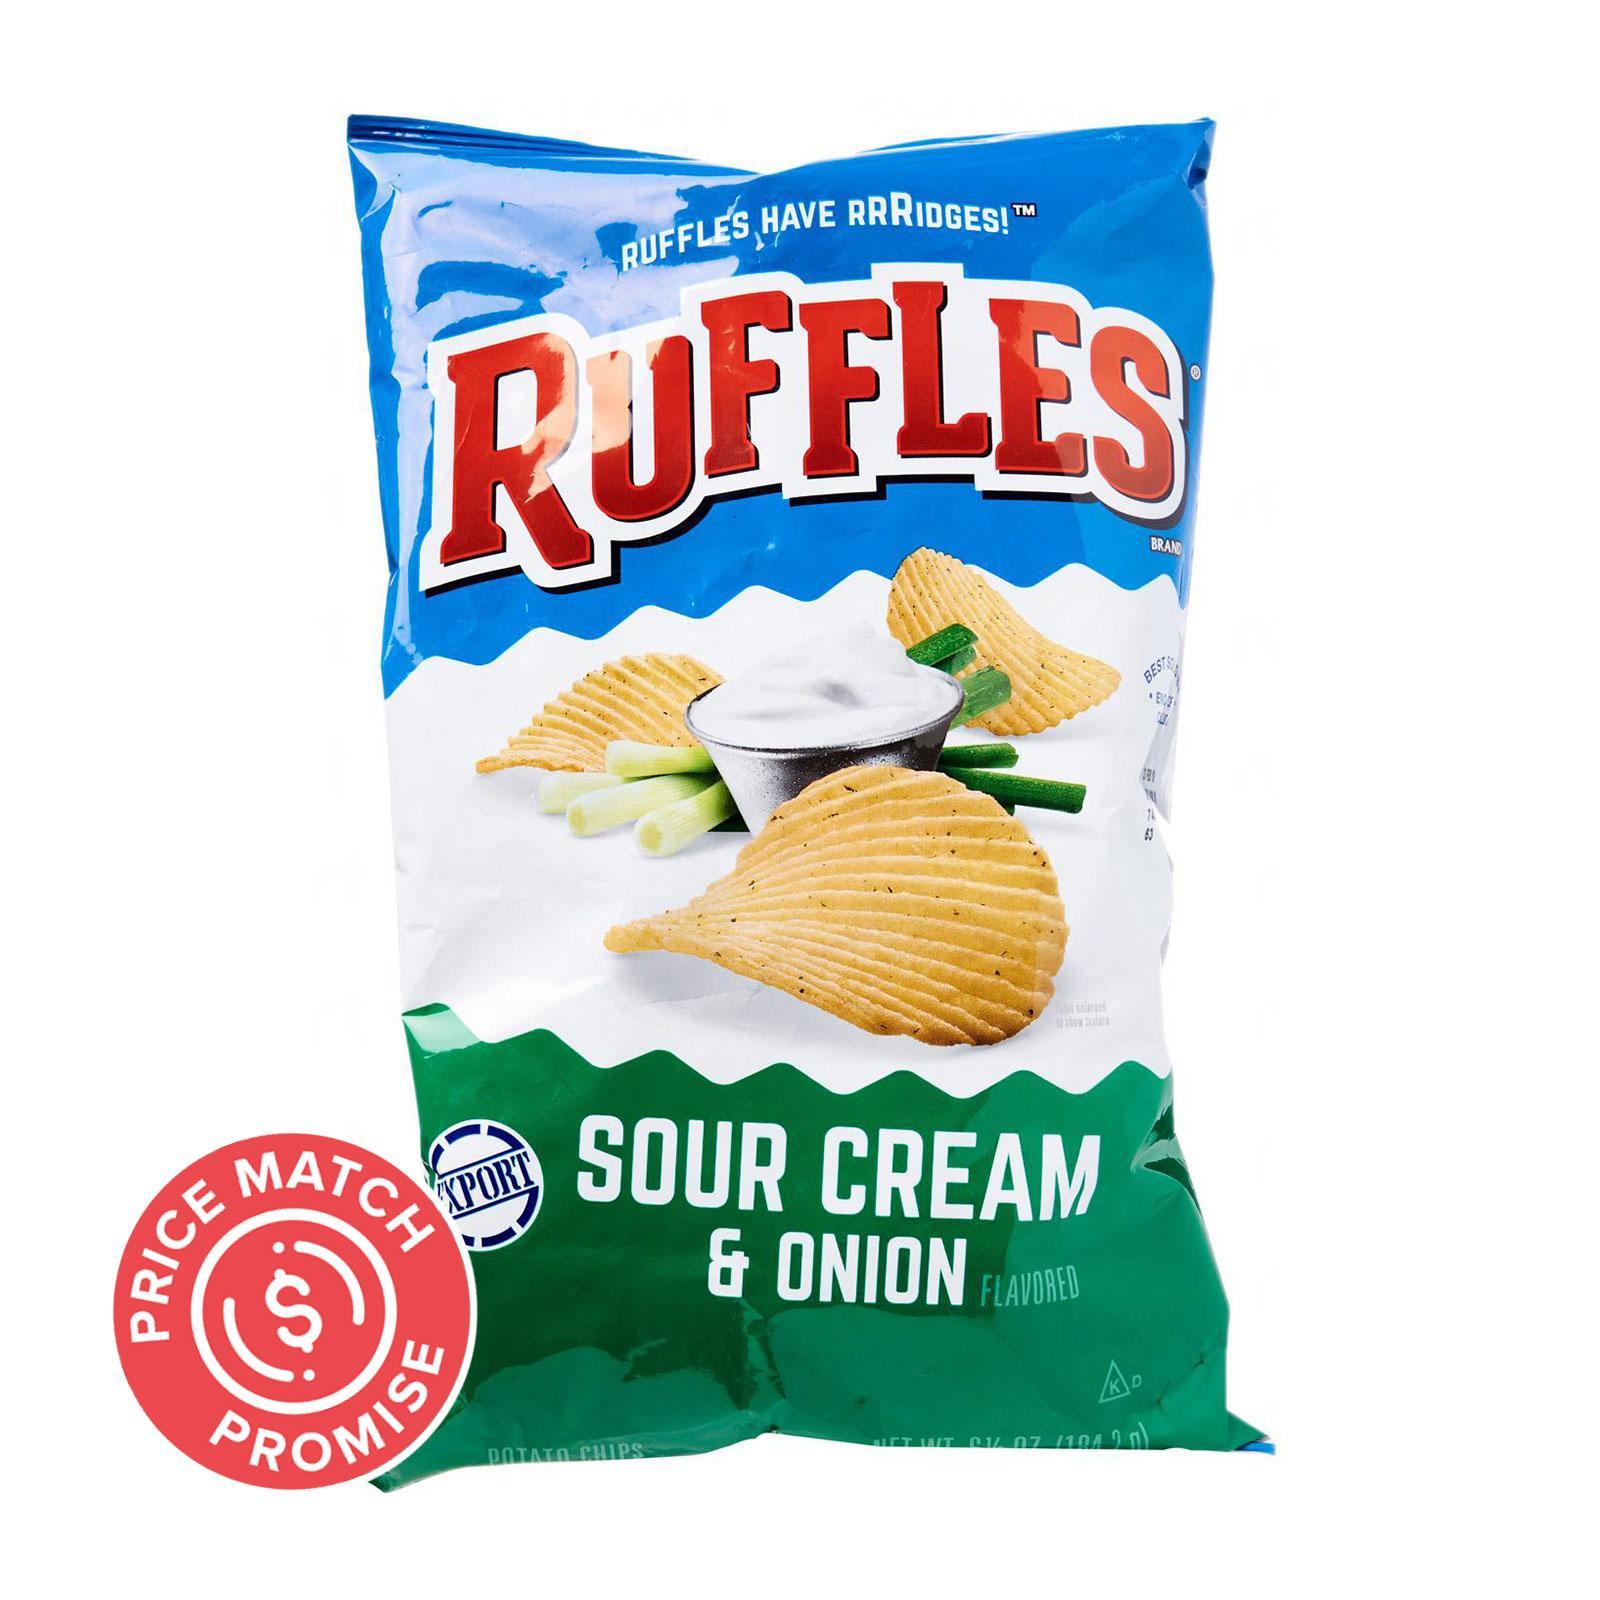 Ruffles Sour Cream and Onion Potato Chips